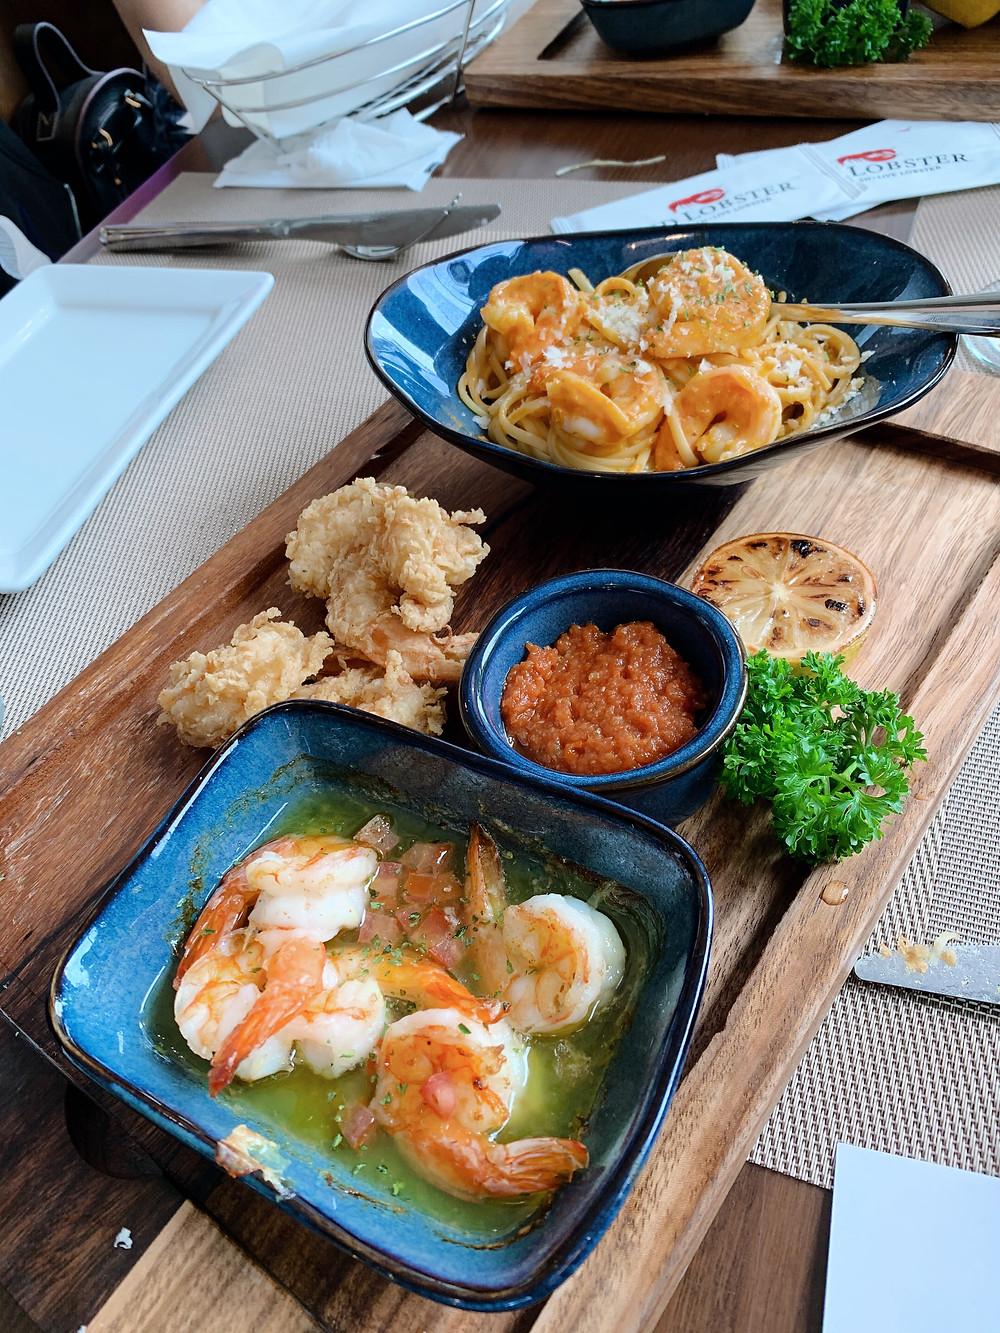 Food at Red Lobster restaurant in Causeway Bay Hong Kong